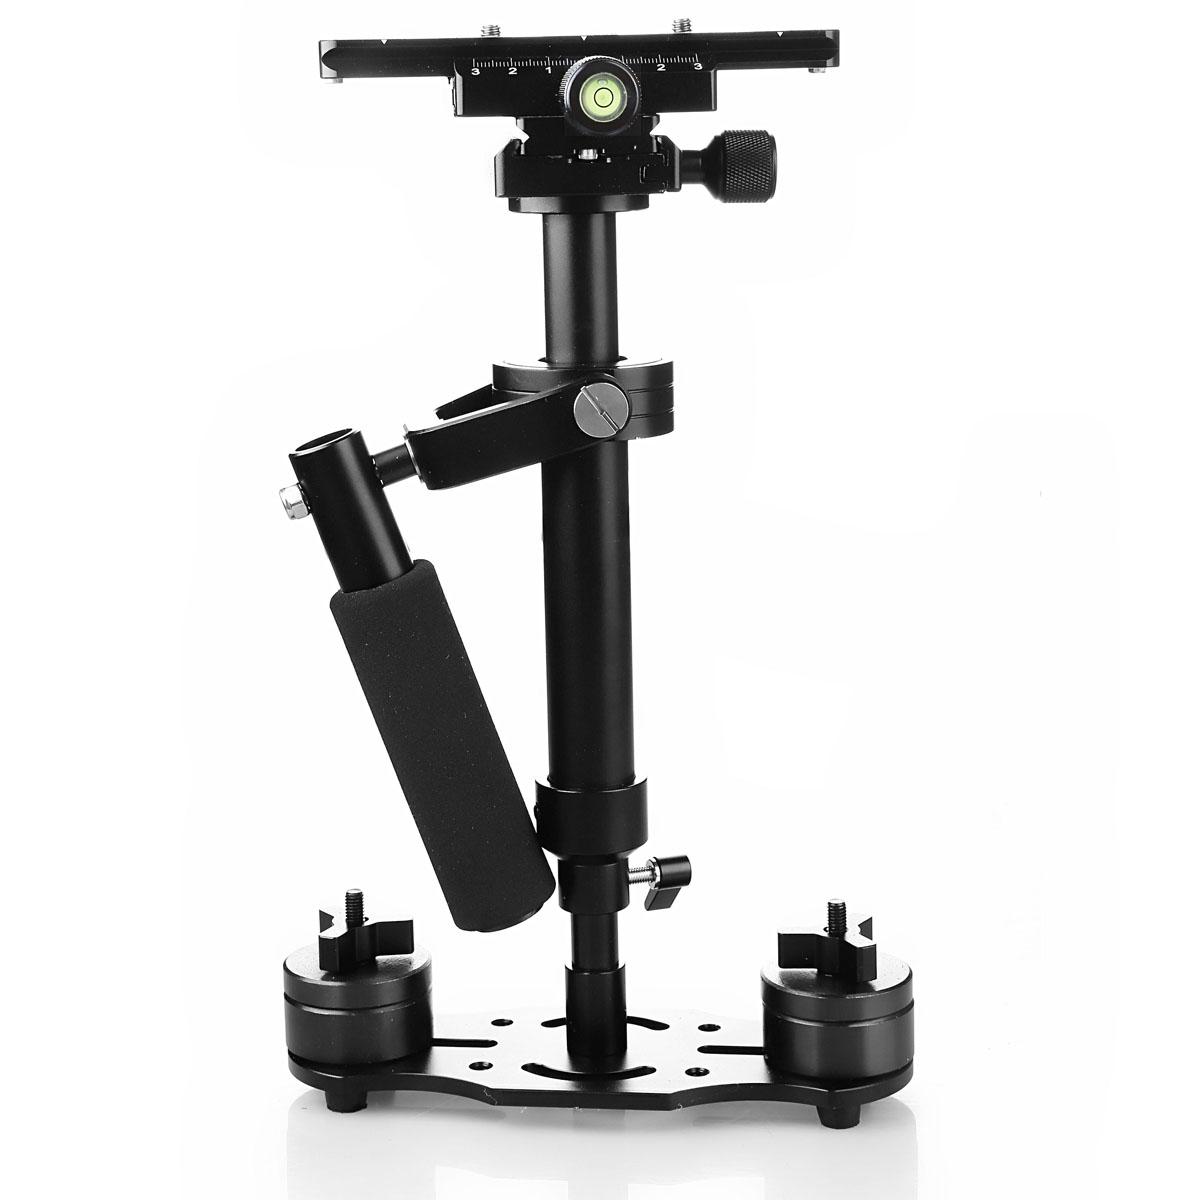 S40+ 0.4M 40CM Carbon Fiber Steadicam Steadycam Stabilizer For Canon Nikon